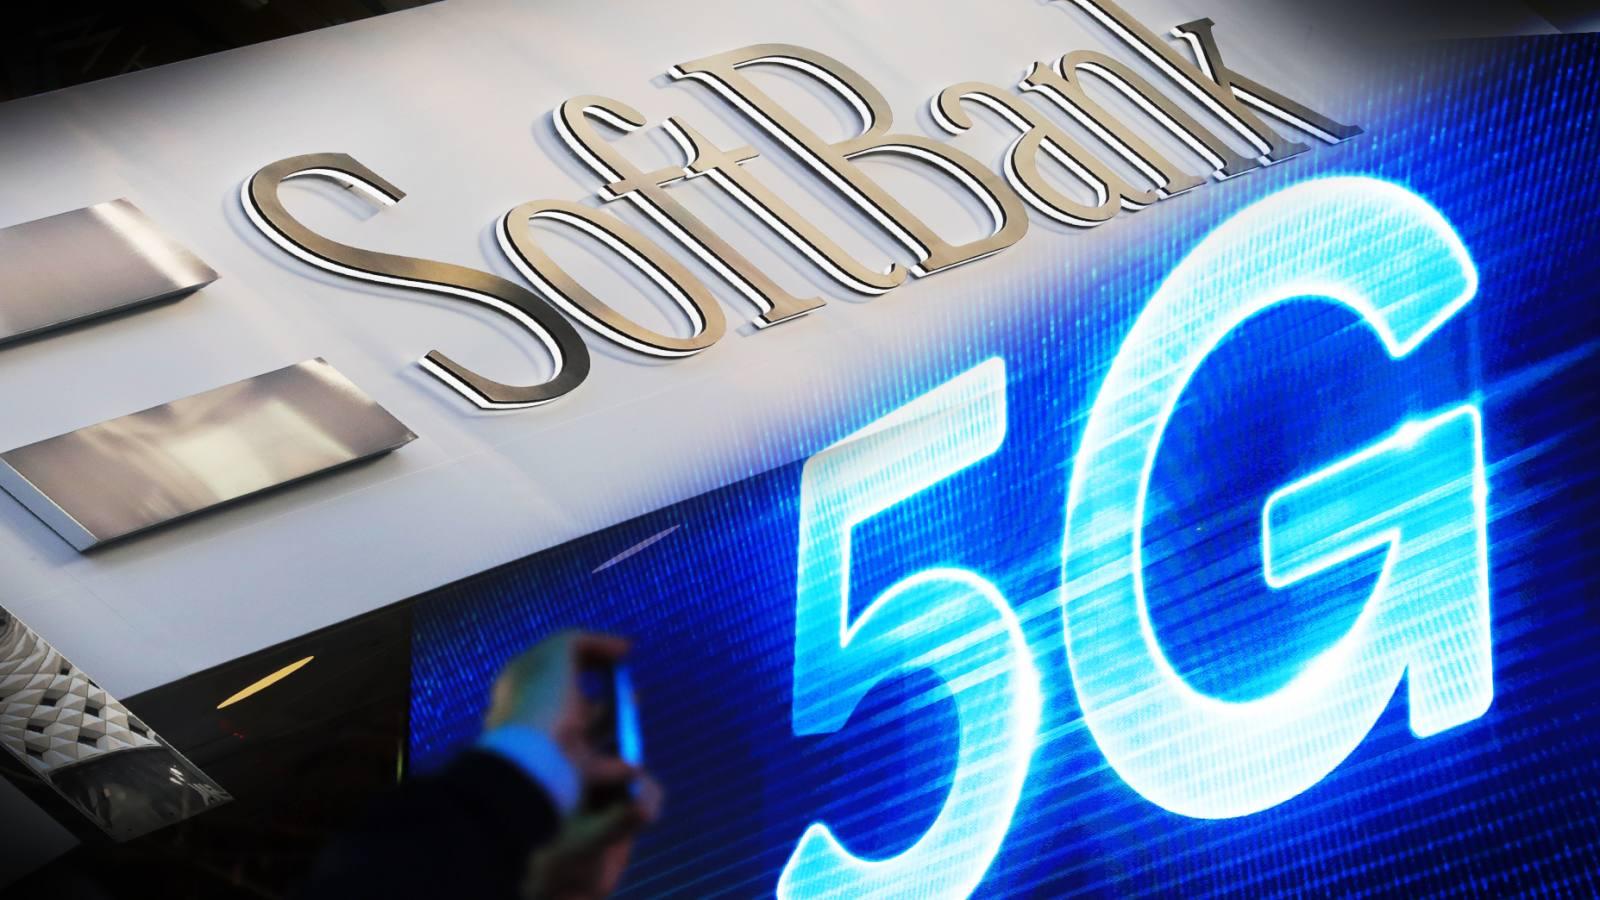 Rise of 5G pushes Japanese companies to pick alliances - Nikkei